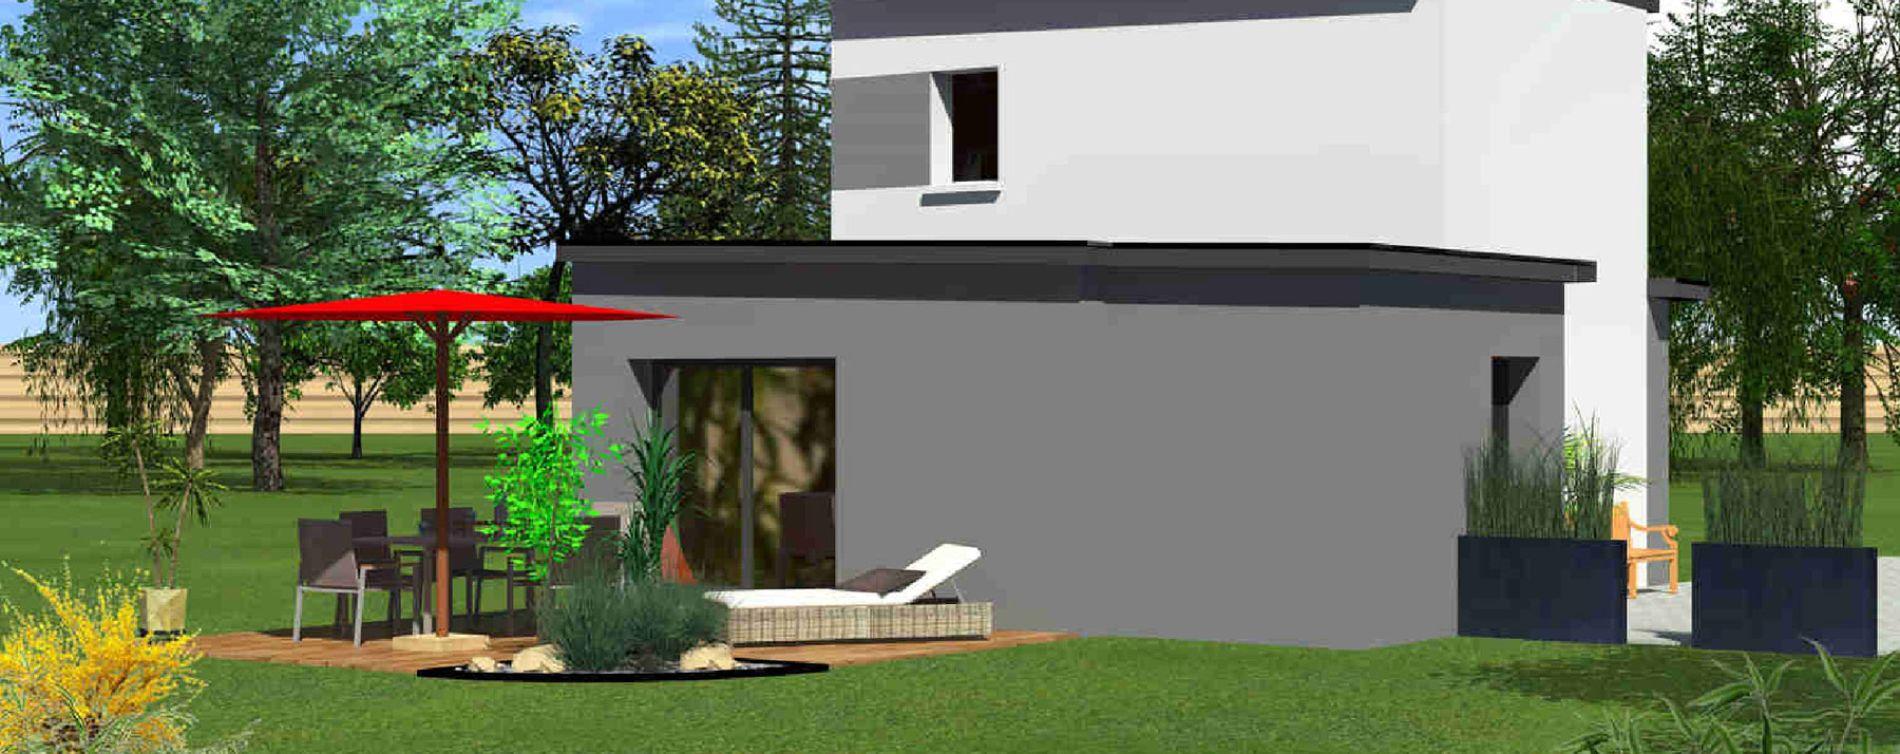 Ploudalmézeau : programme immobilier neuve « Roscaroc » (4)